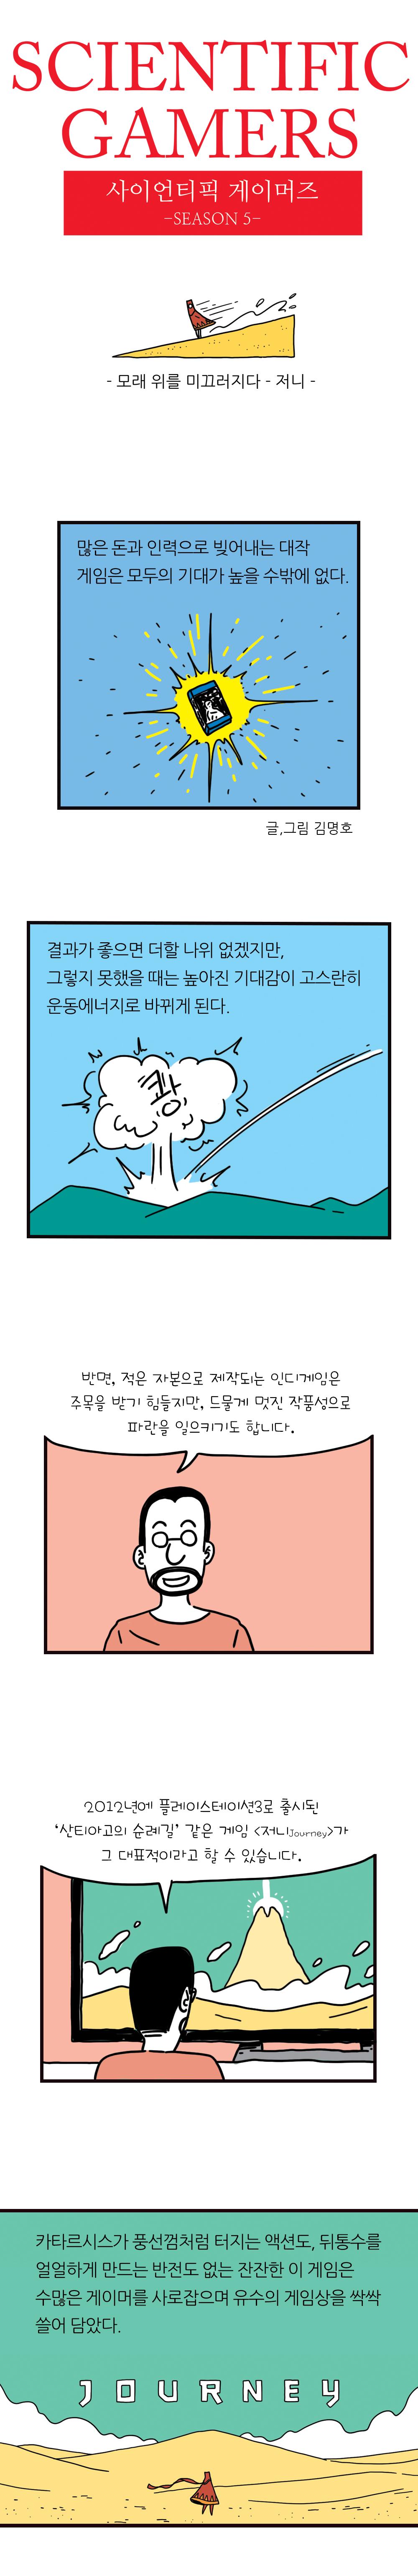 SG_S5_10_Journey_01